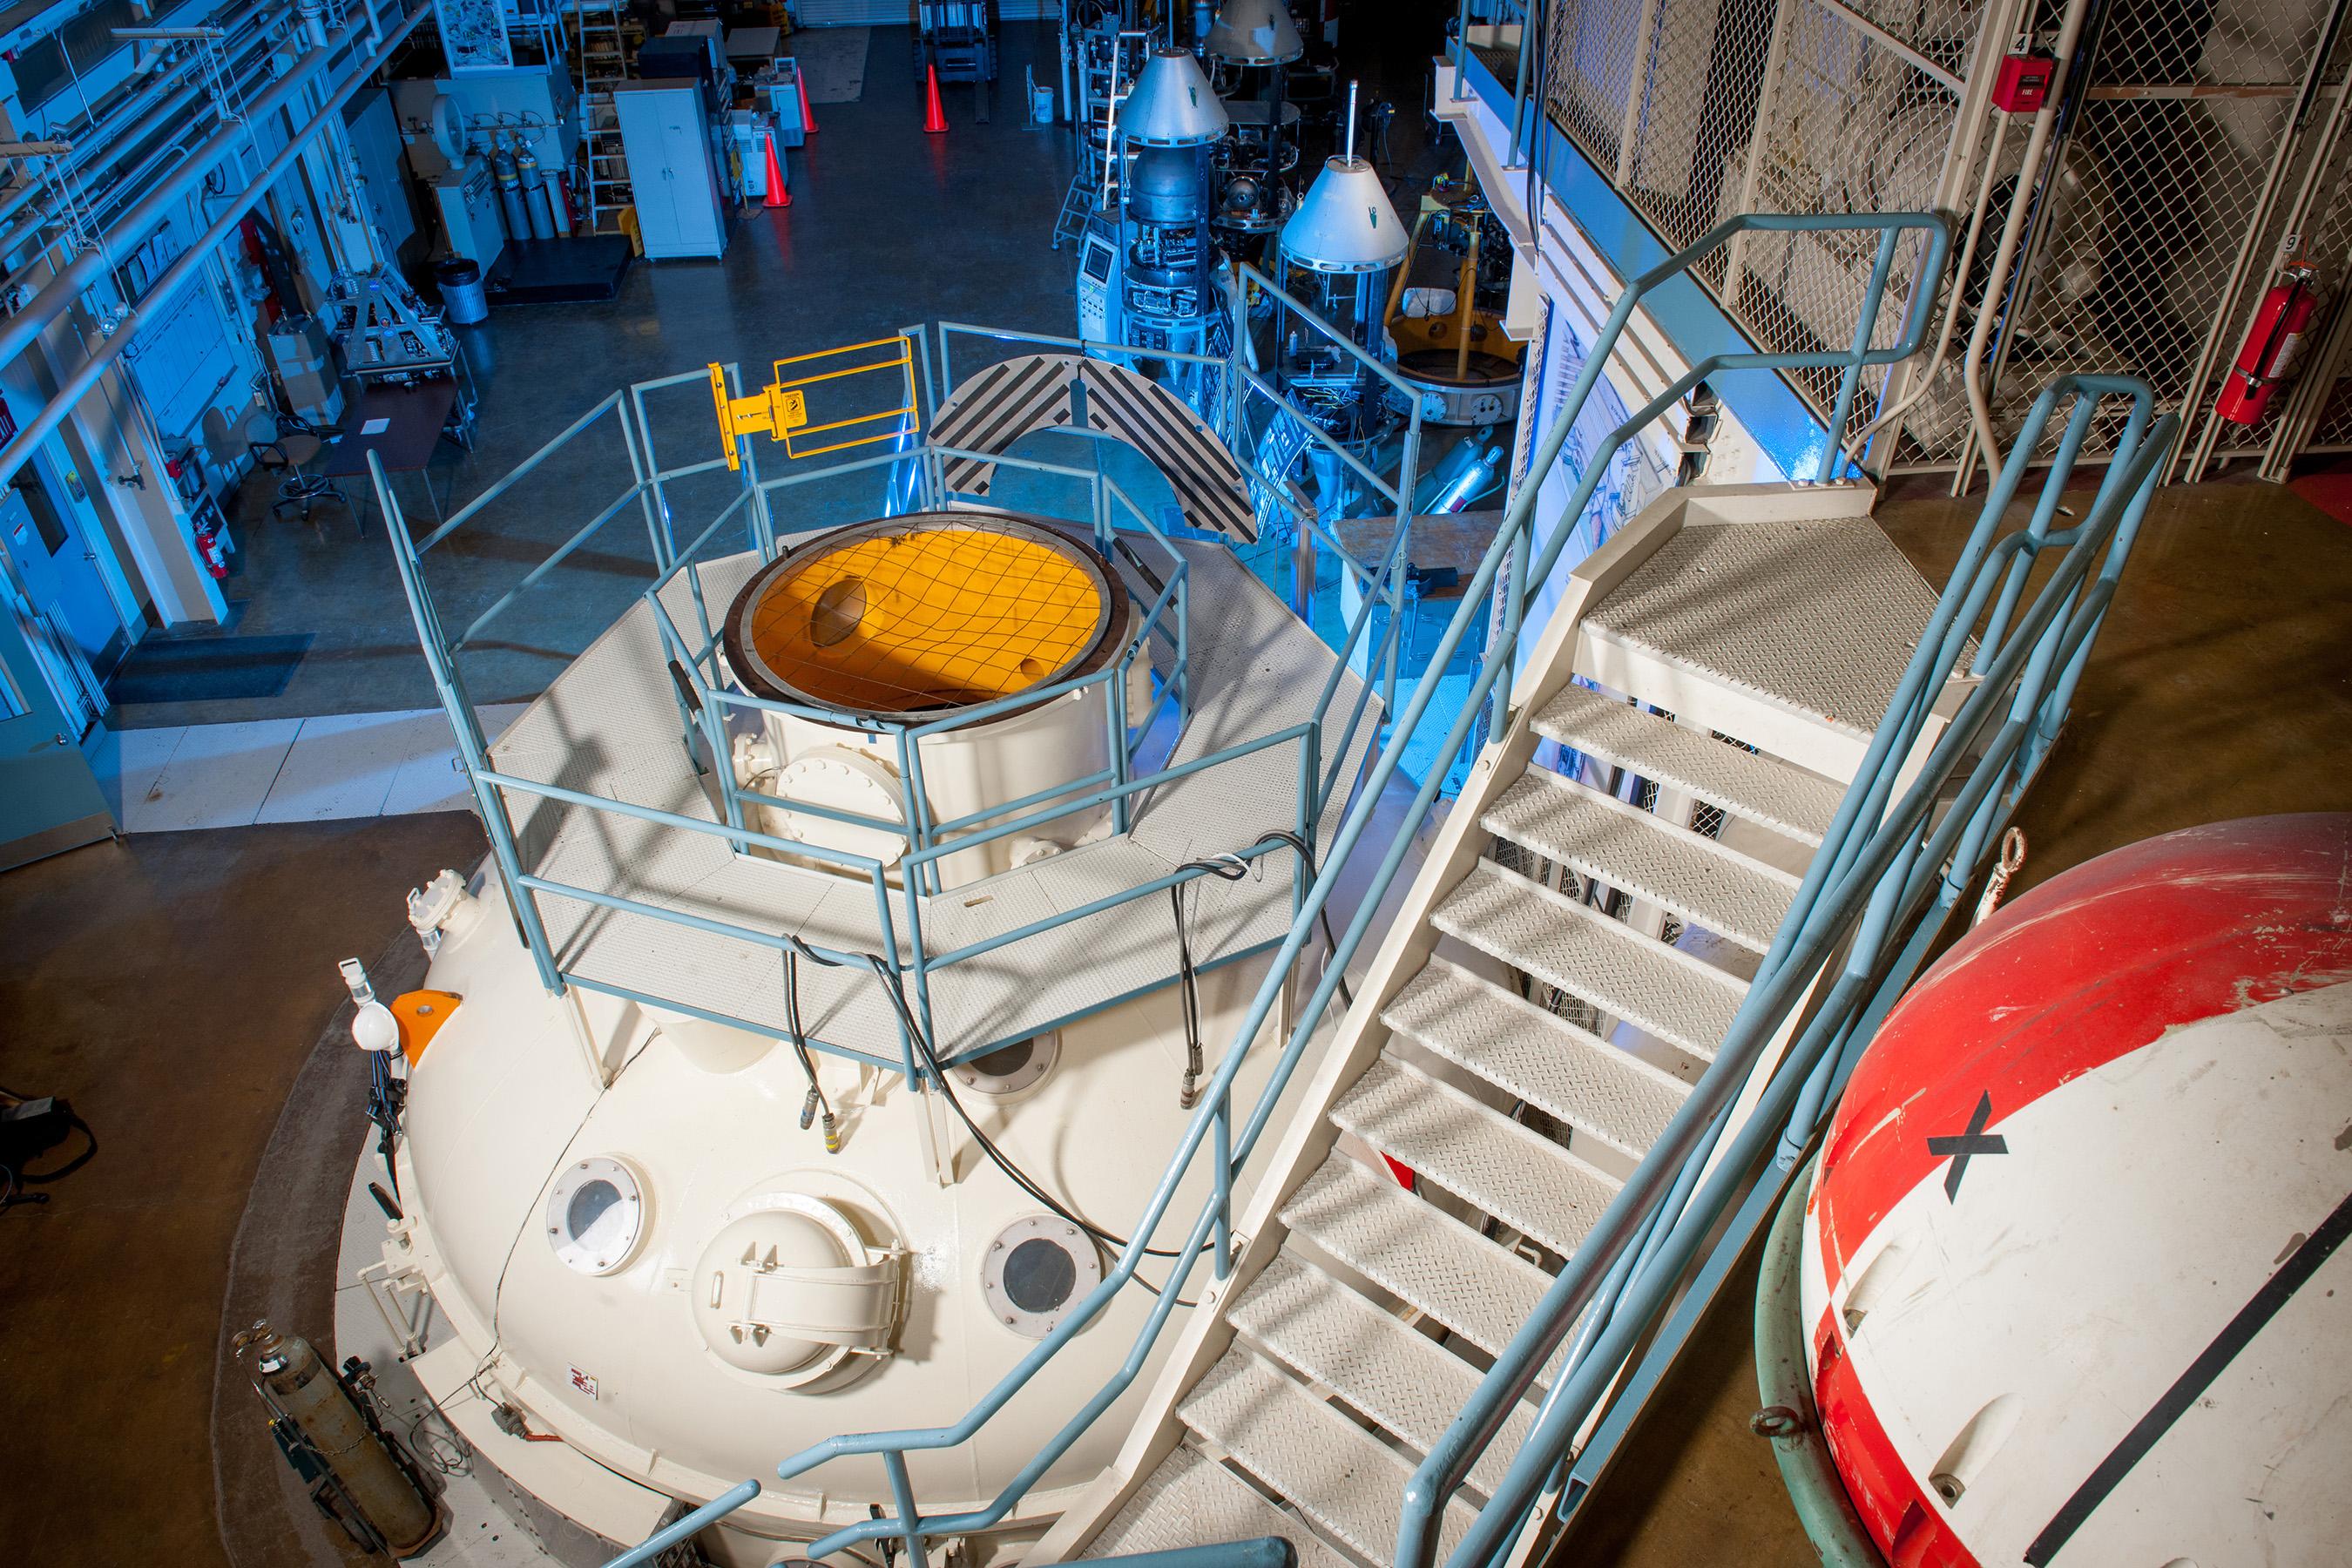 The Zero Gravity Research Facility is NASA